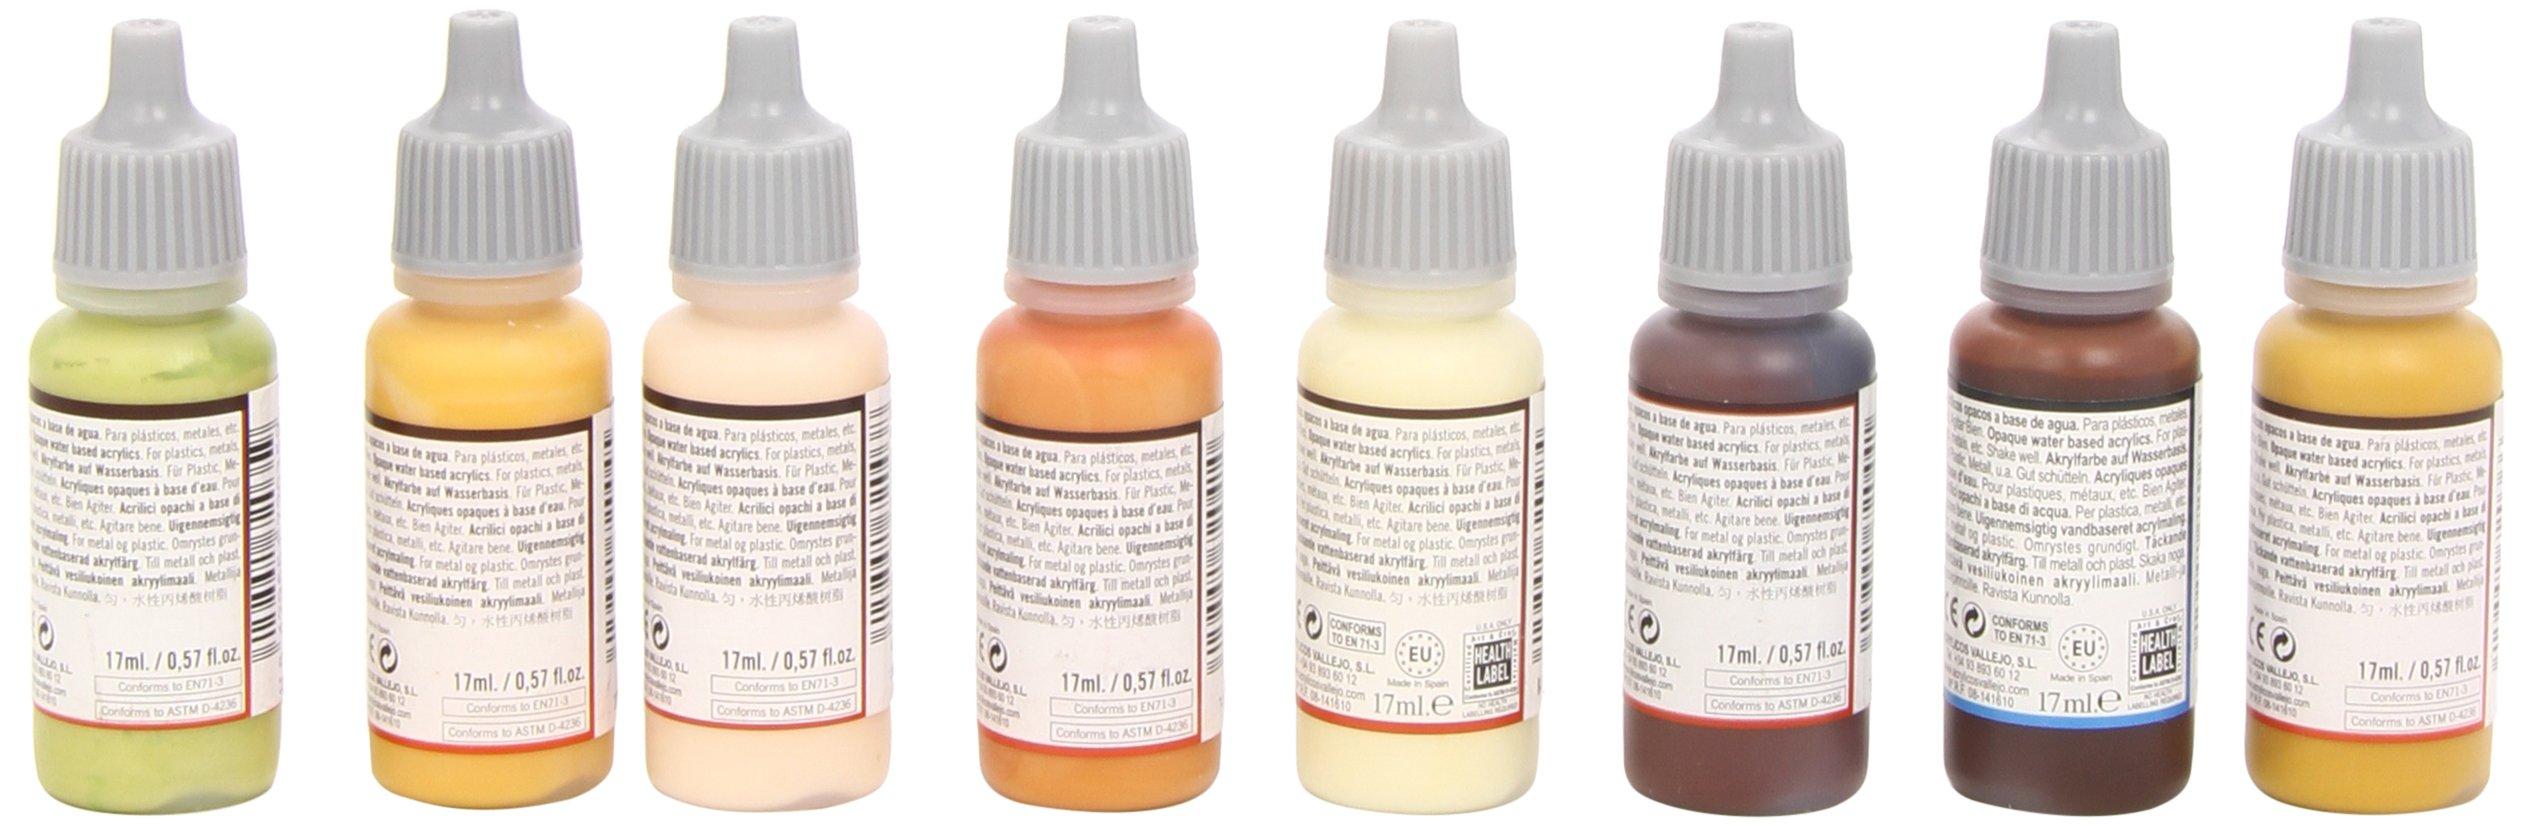 Vallejo Skin Tones Paint Set (8 Color) Paint by Vallejo (Image #2)